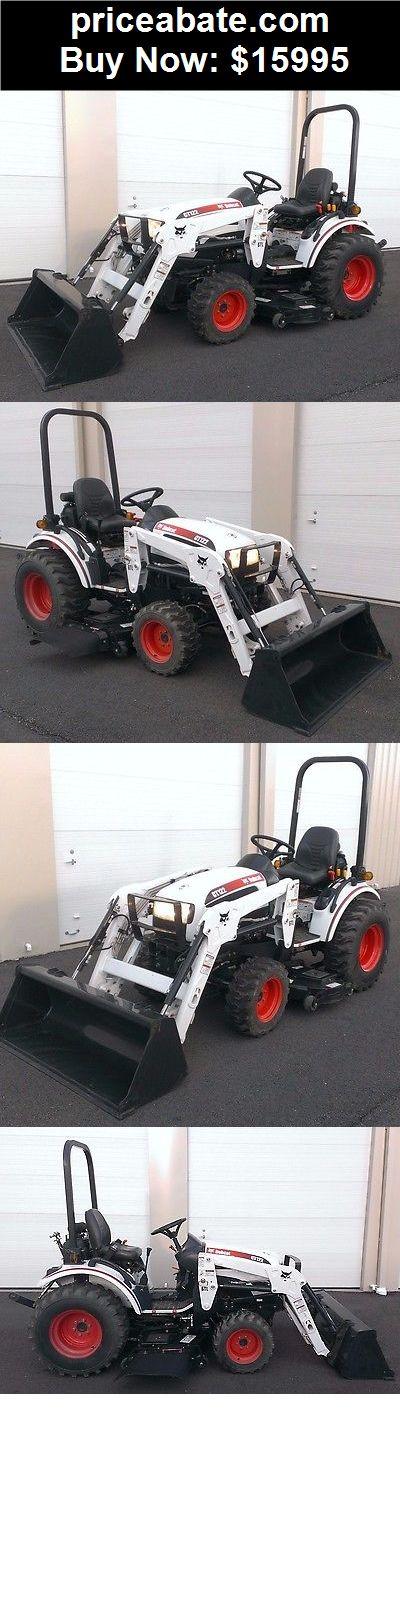 Heavy-Equipments: BOBCAT CT122 UTILITY FARM TRACTOR LOADER LAWN MOWER John Deere Kubota Kioti 2320 - BUY IT NOW ONLY $15995